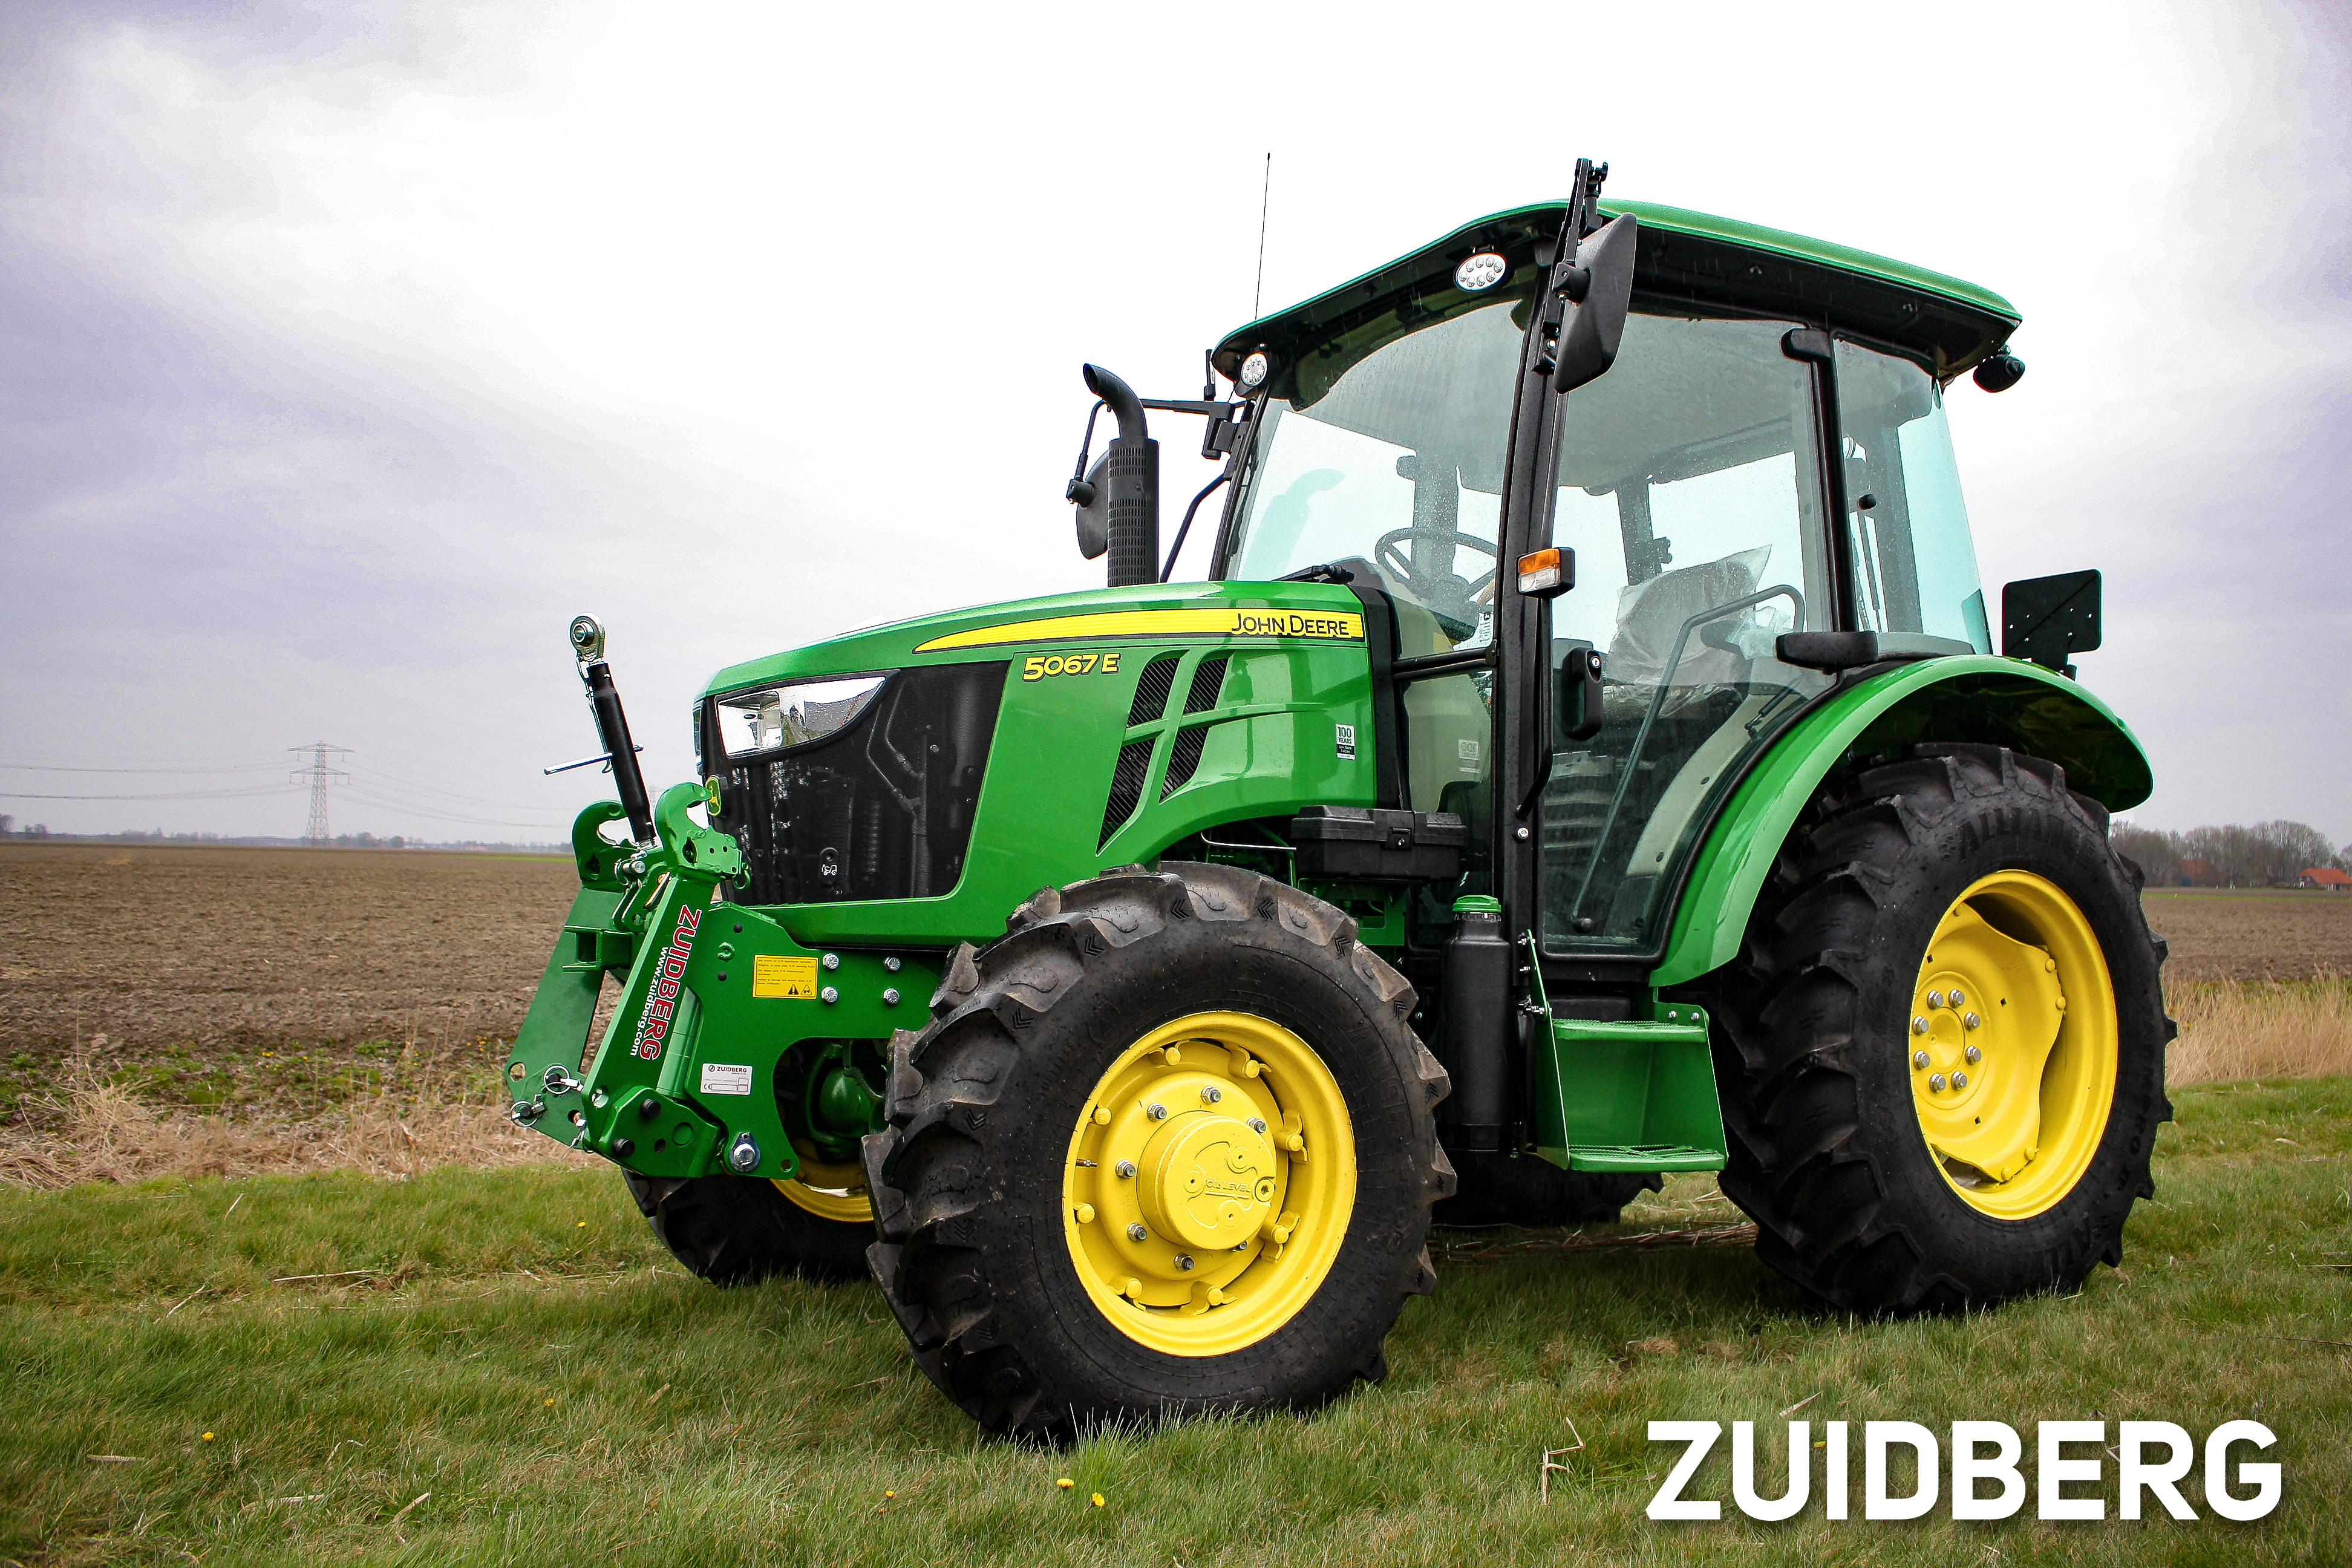 ZuidbergJohn Deere 5000 E -serie (TIER 4 INTERIM) 5058